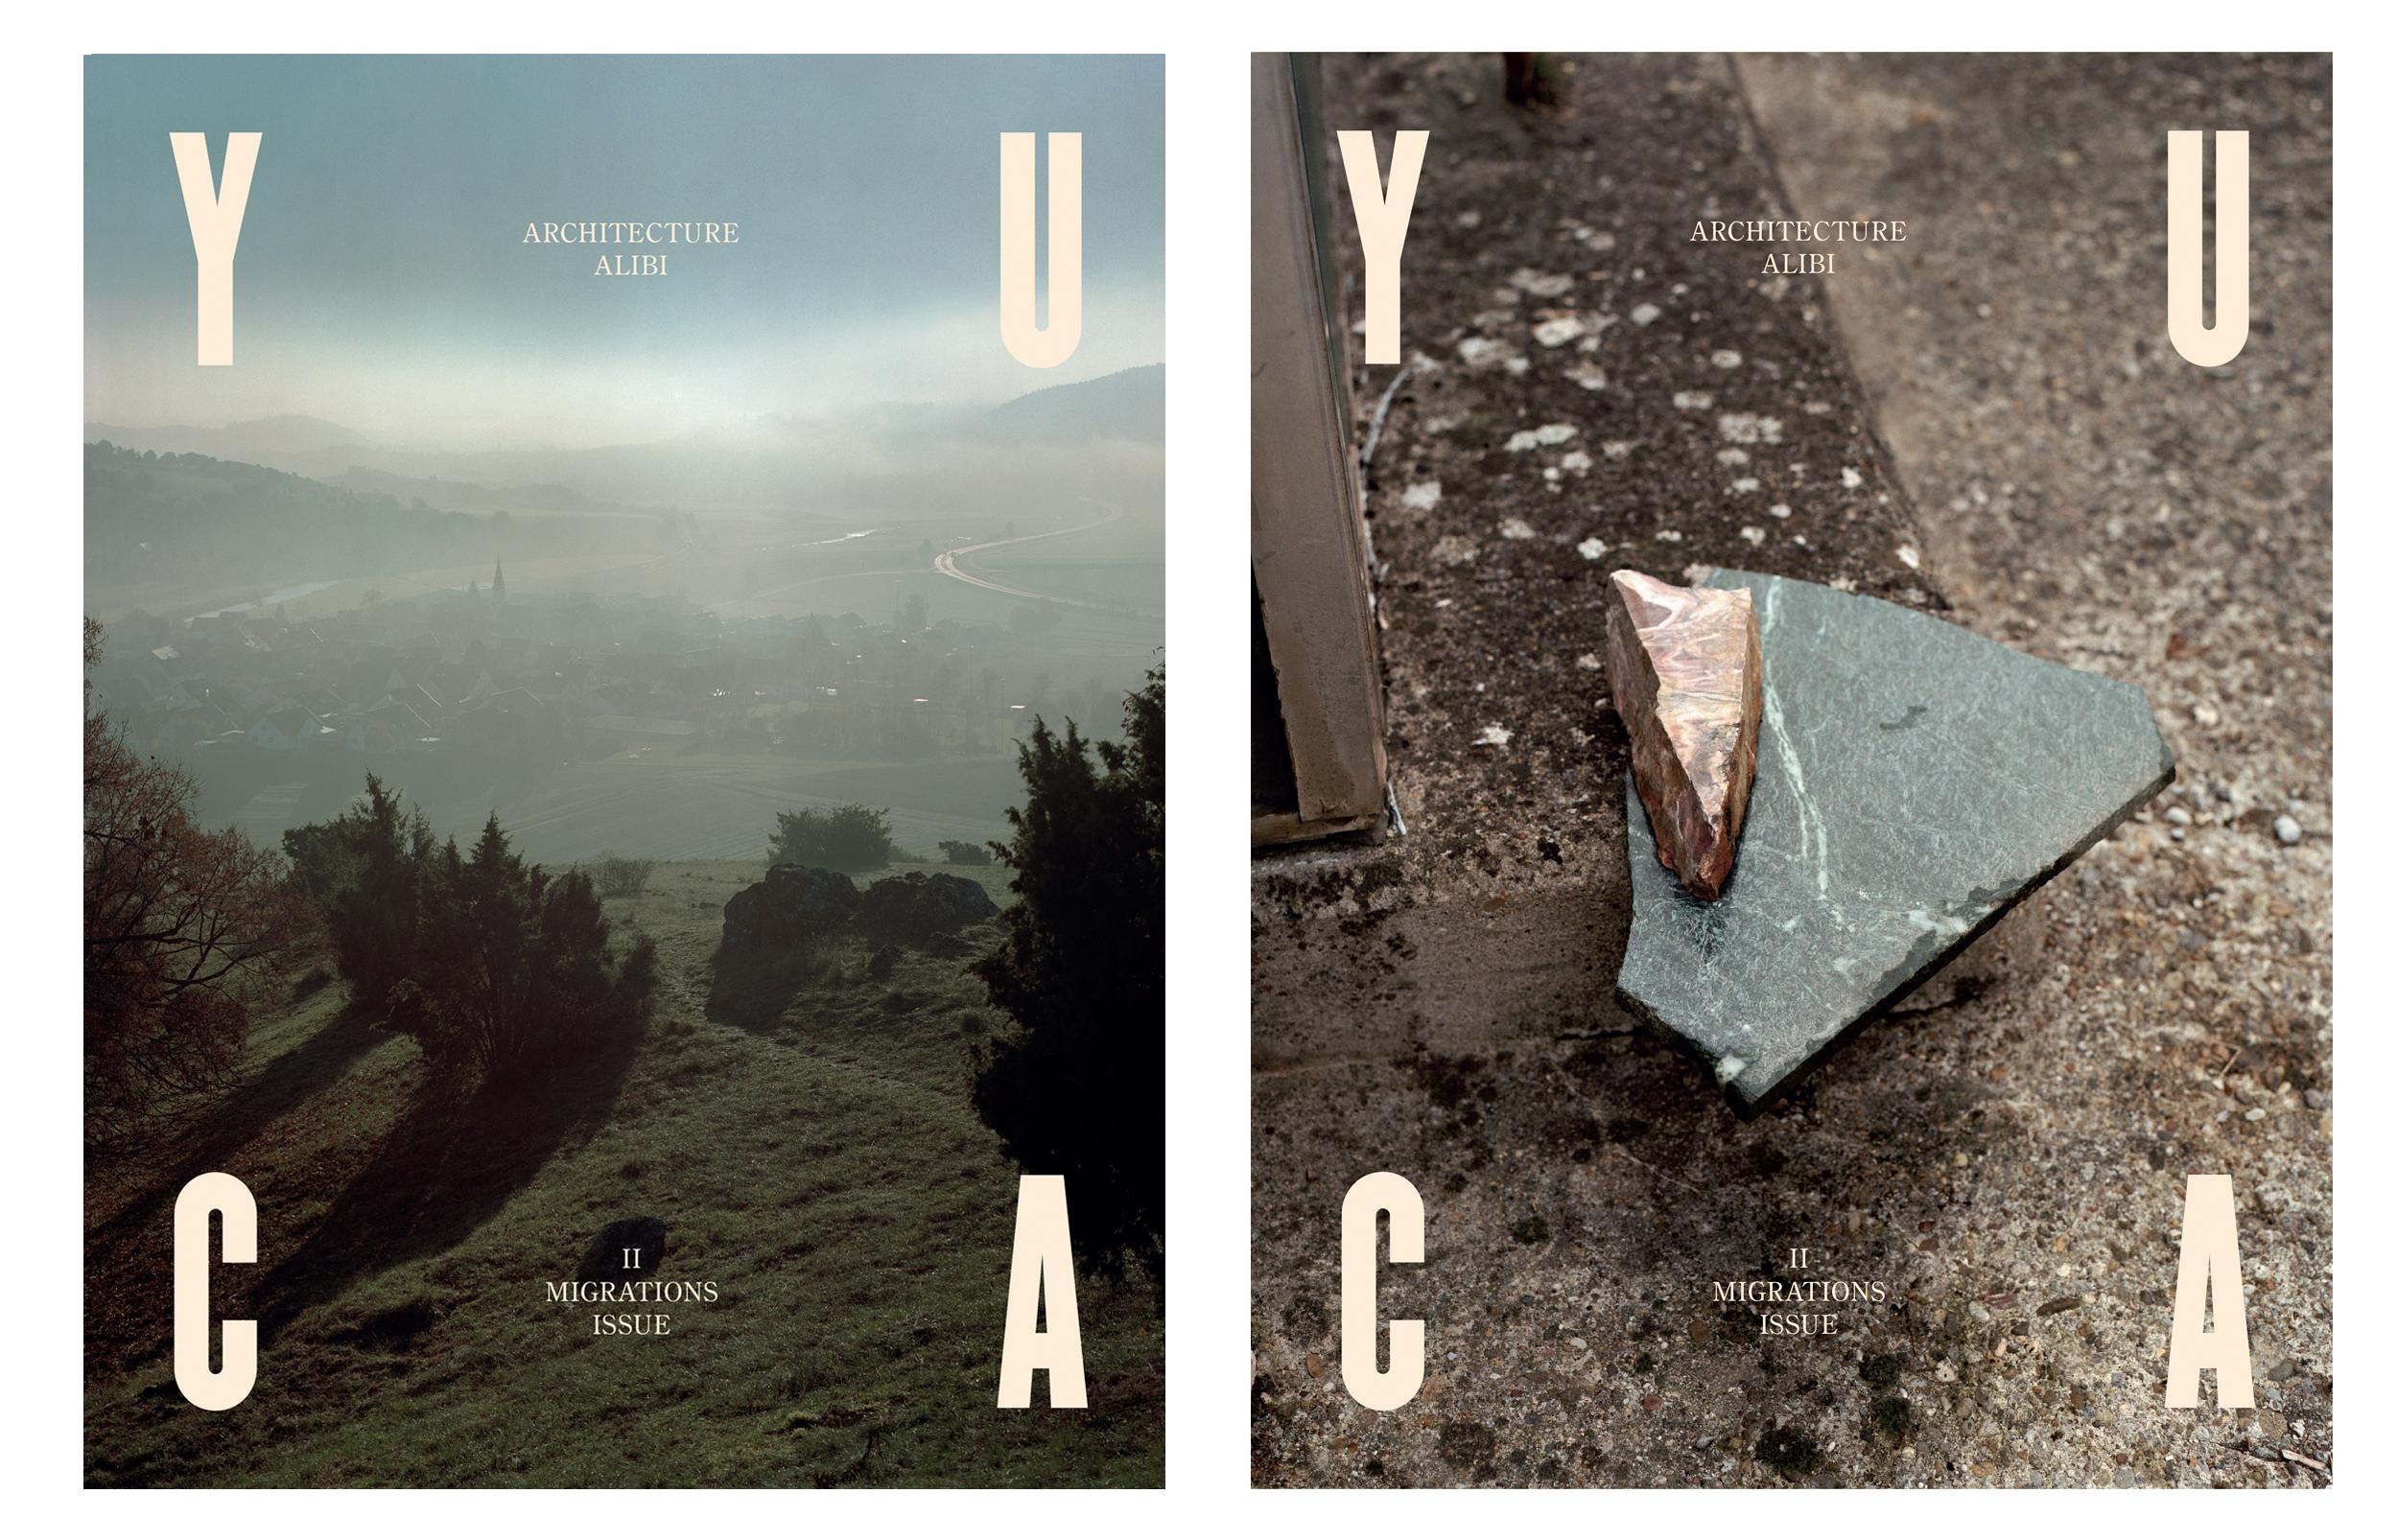 Yuca magazine Architecture Alibi